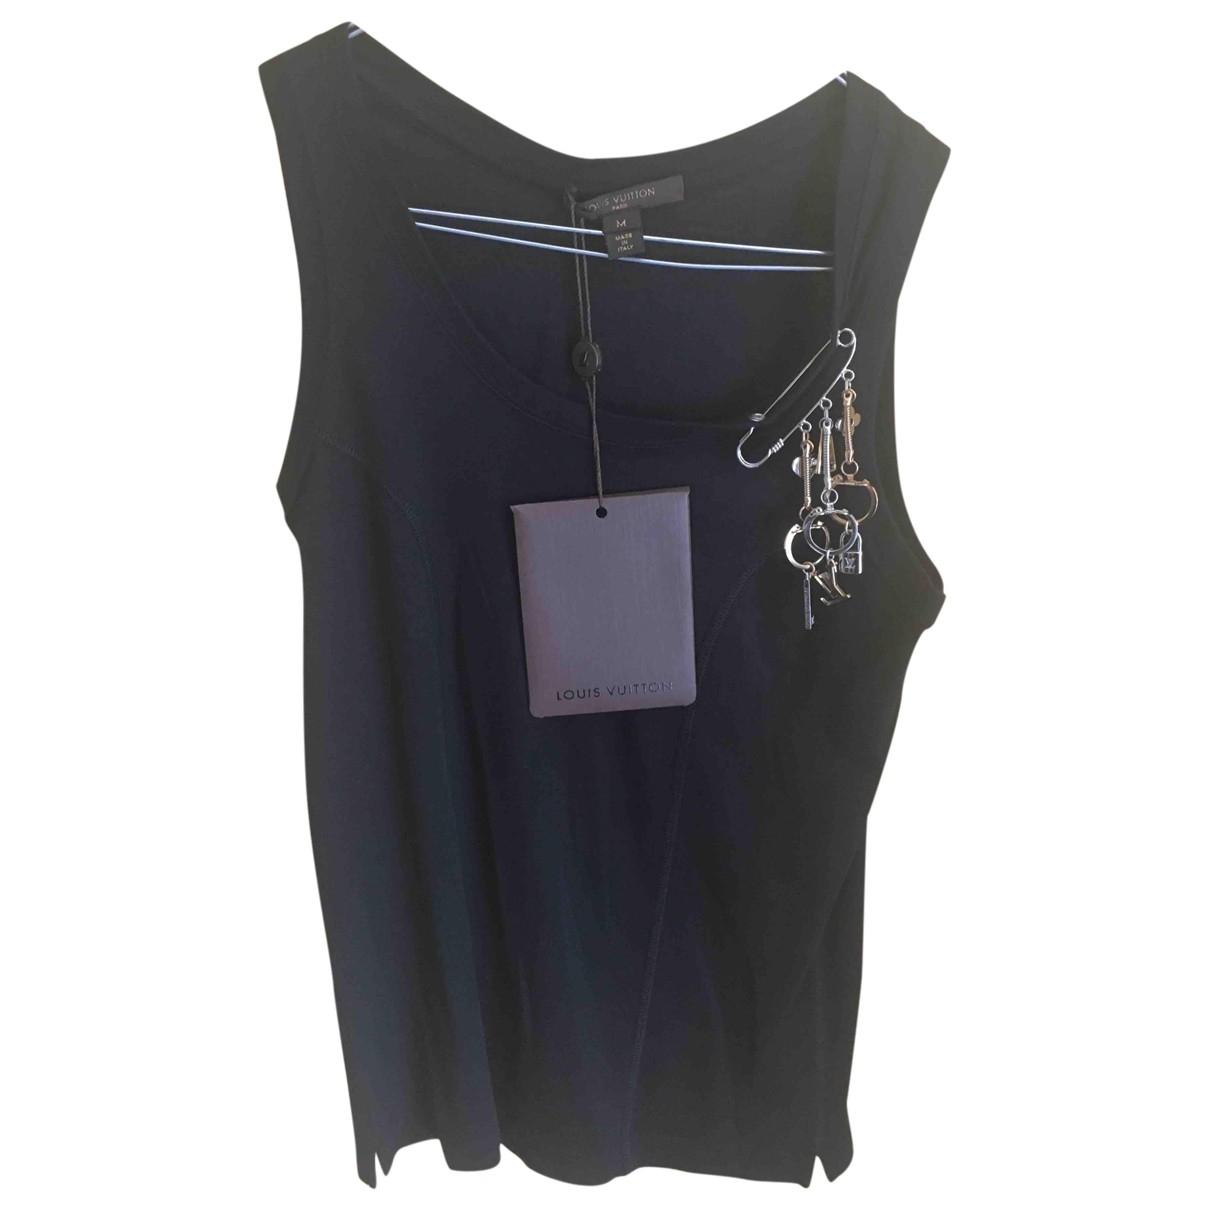 Louis Vuitton \N Black Cotton  top for Women M International